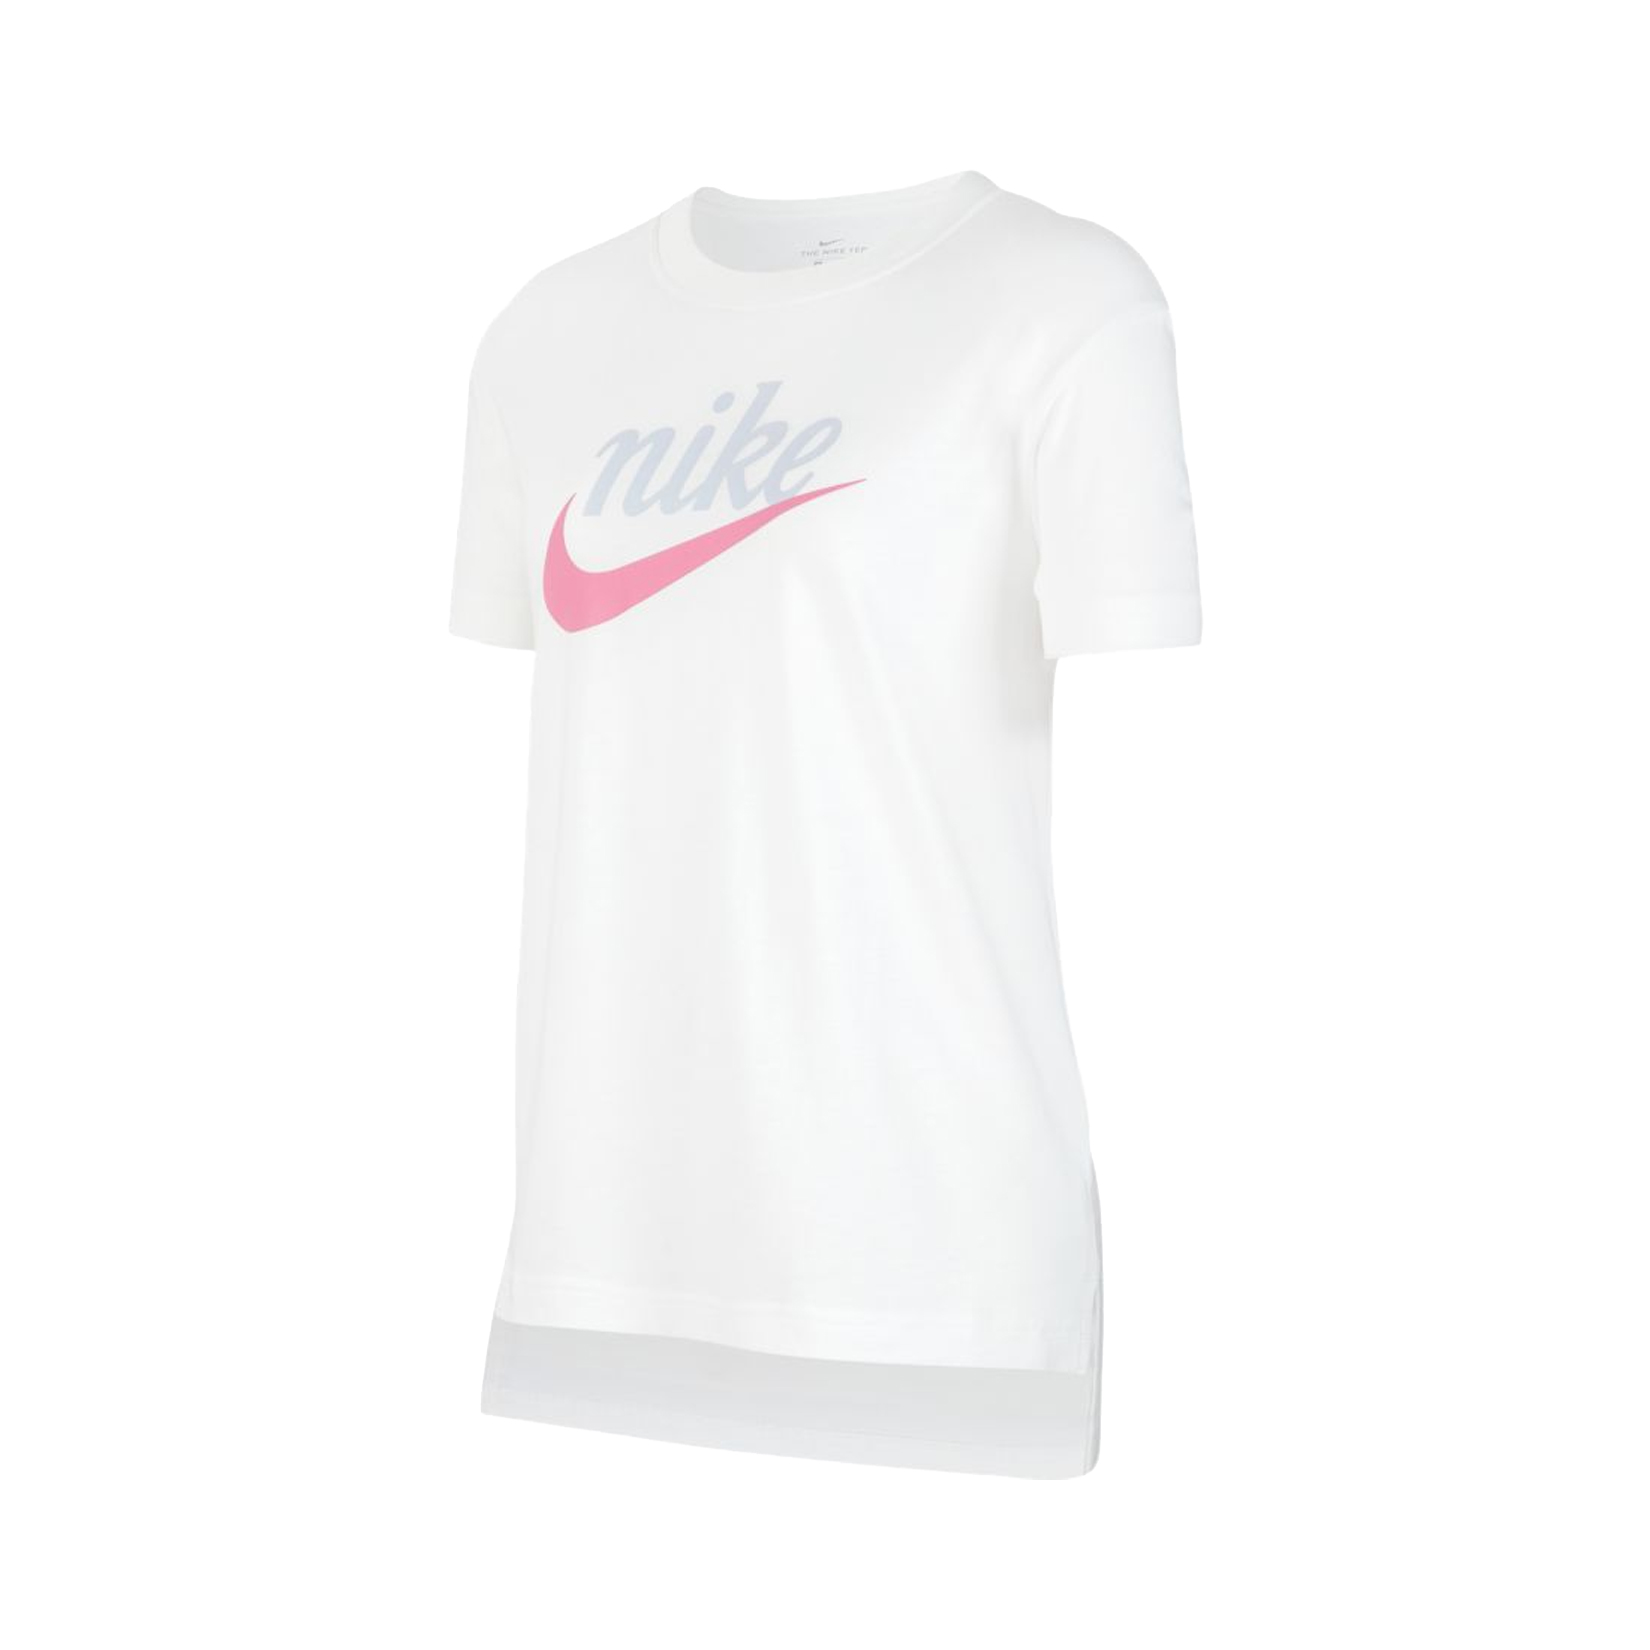 Nike Sportswear Script Futura Big Kids Girls White